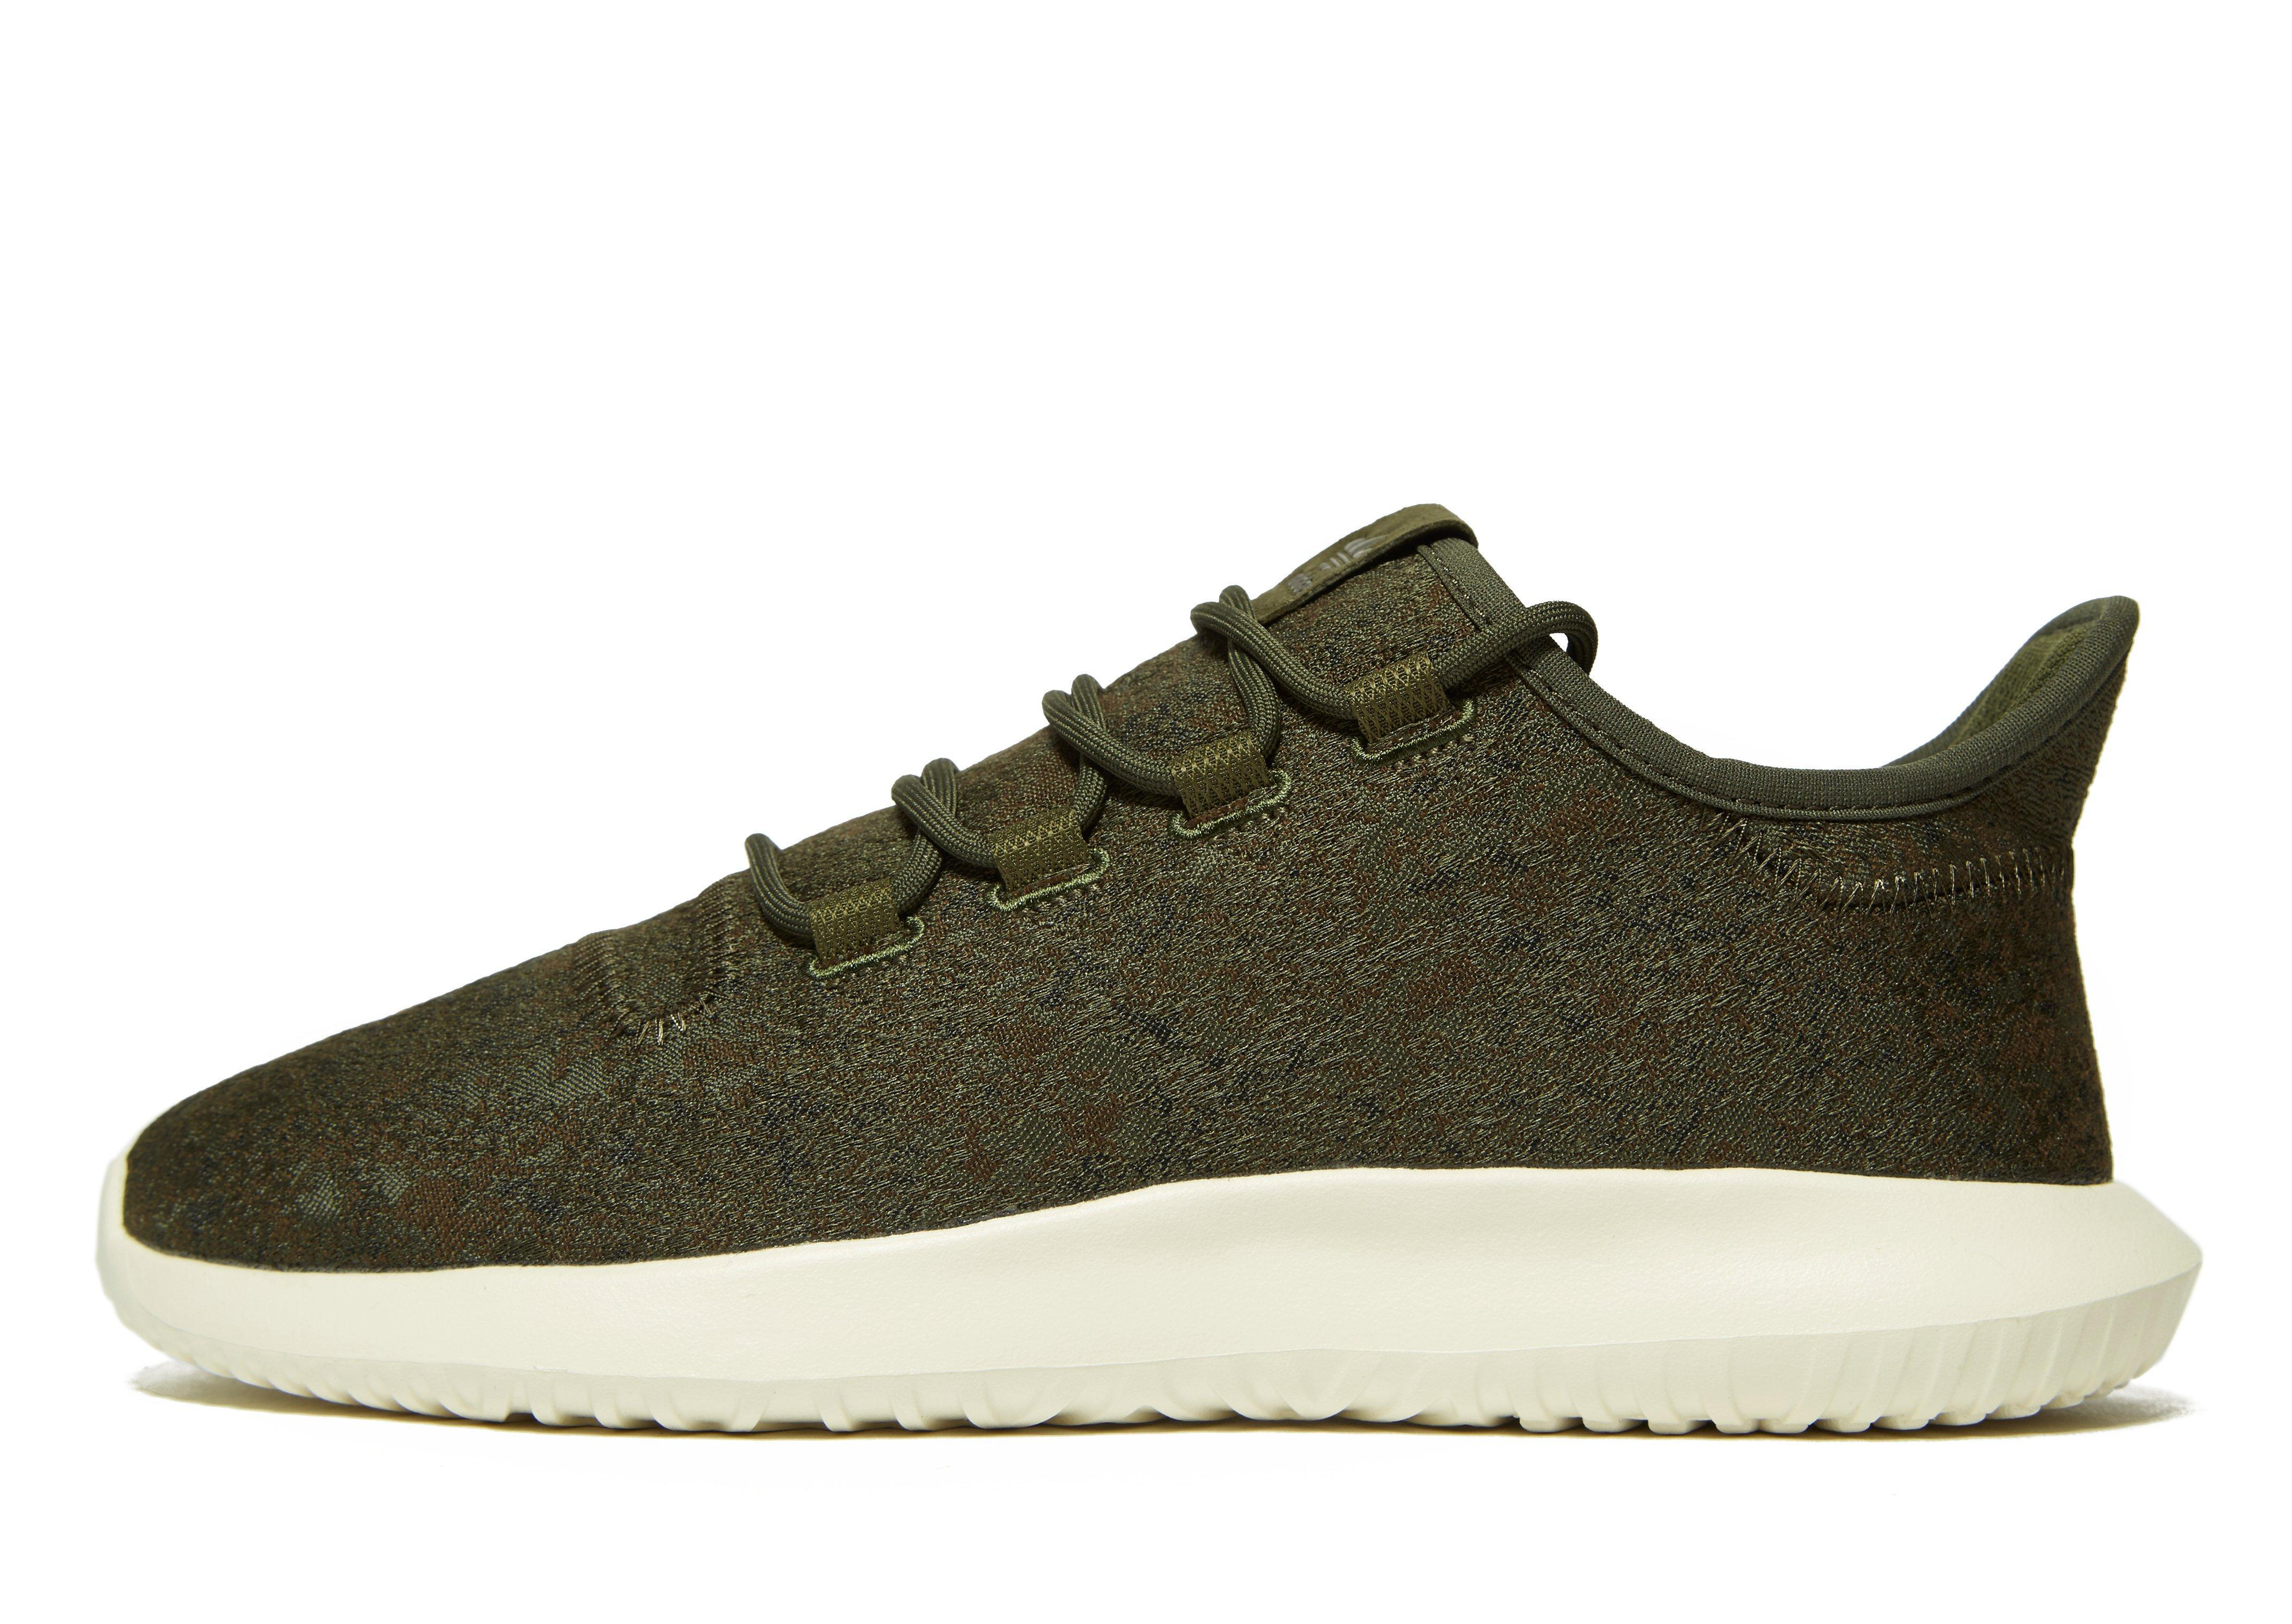 2e2ebaa29db23d Adidas Originals Tubular Shadow Jacquard in Green for Men - Lyst